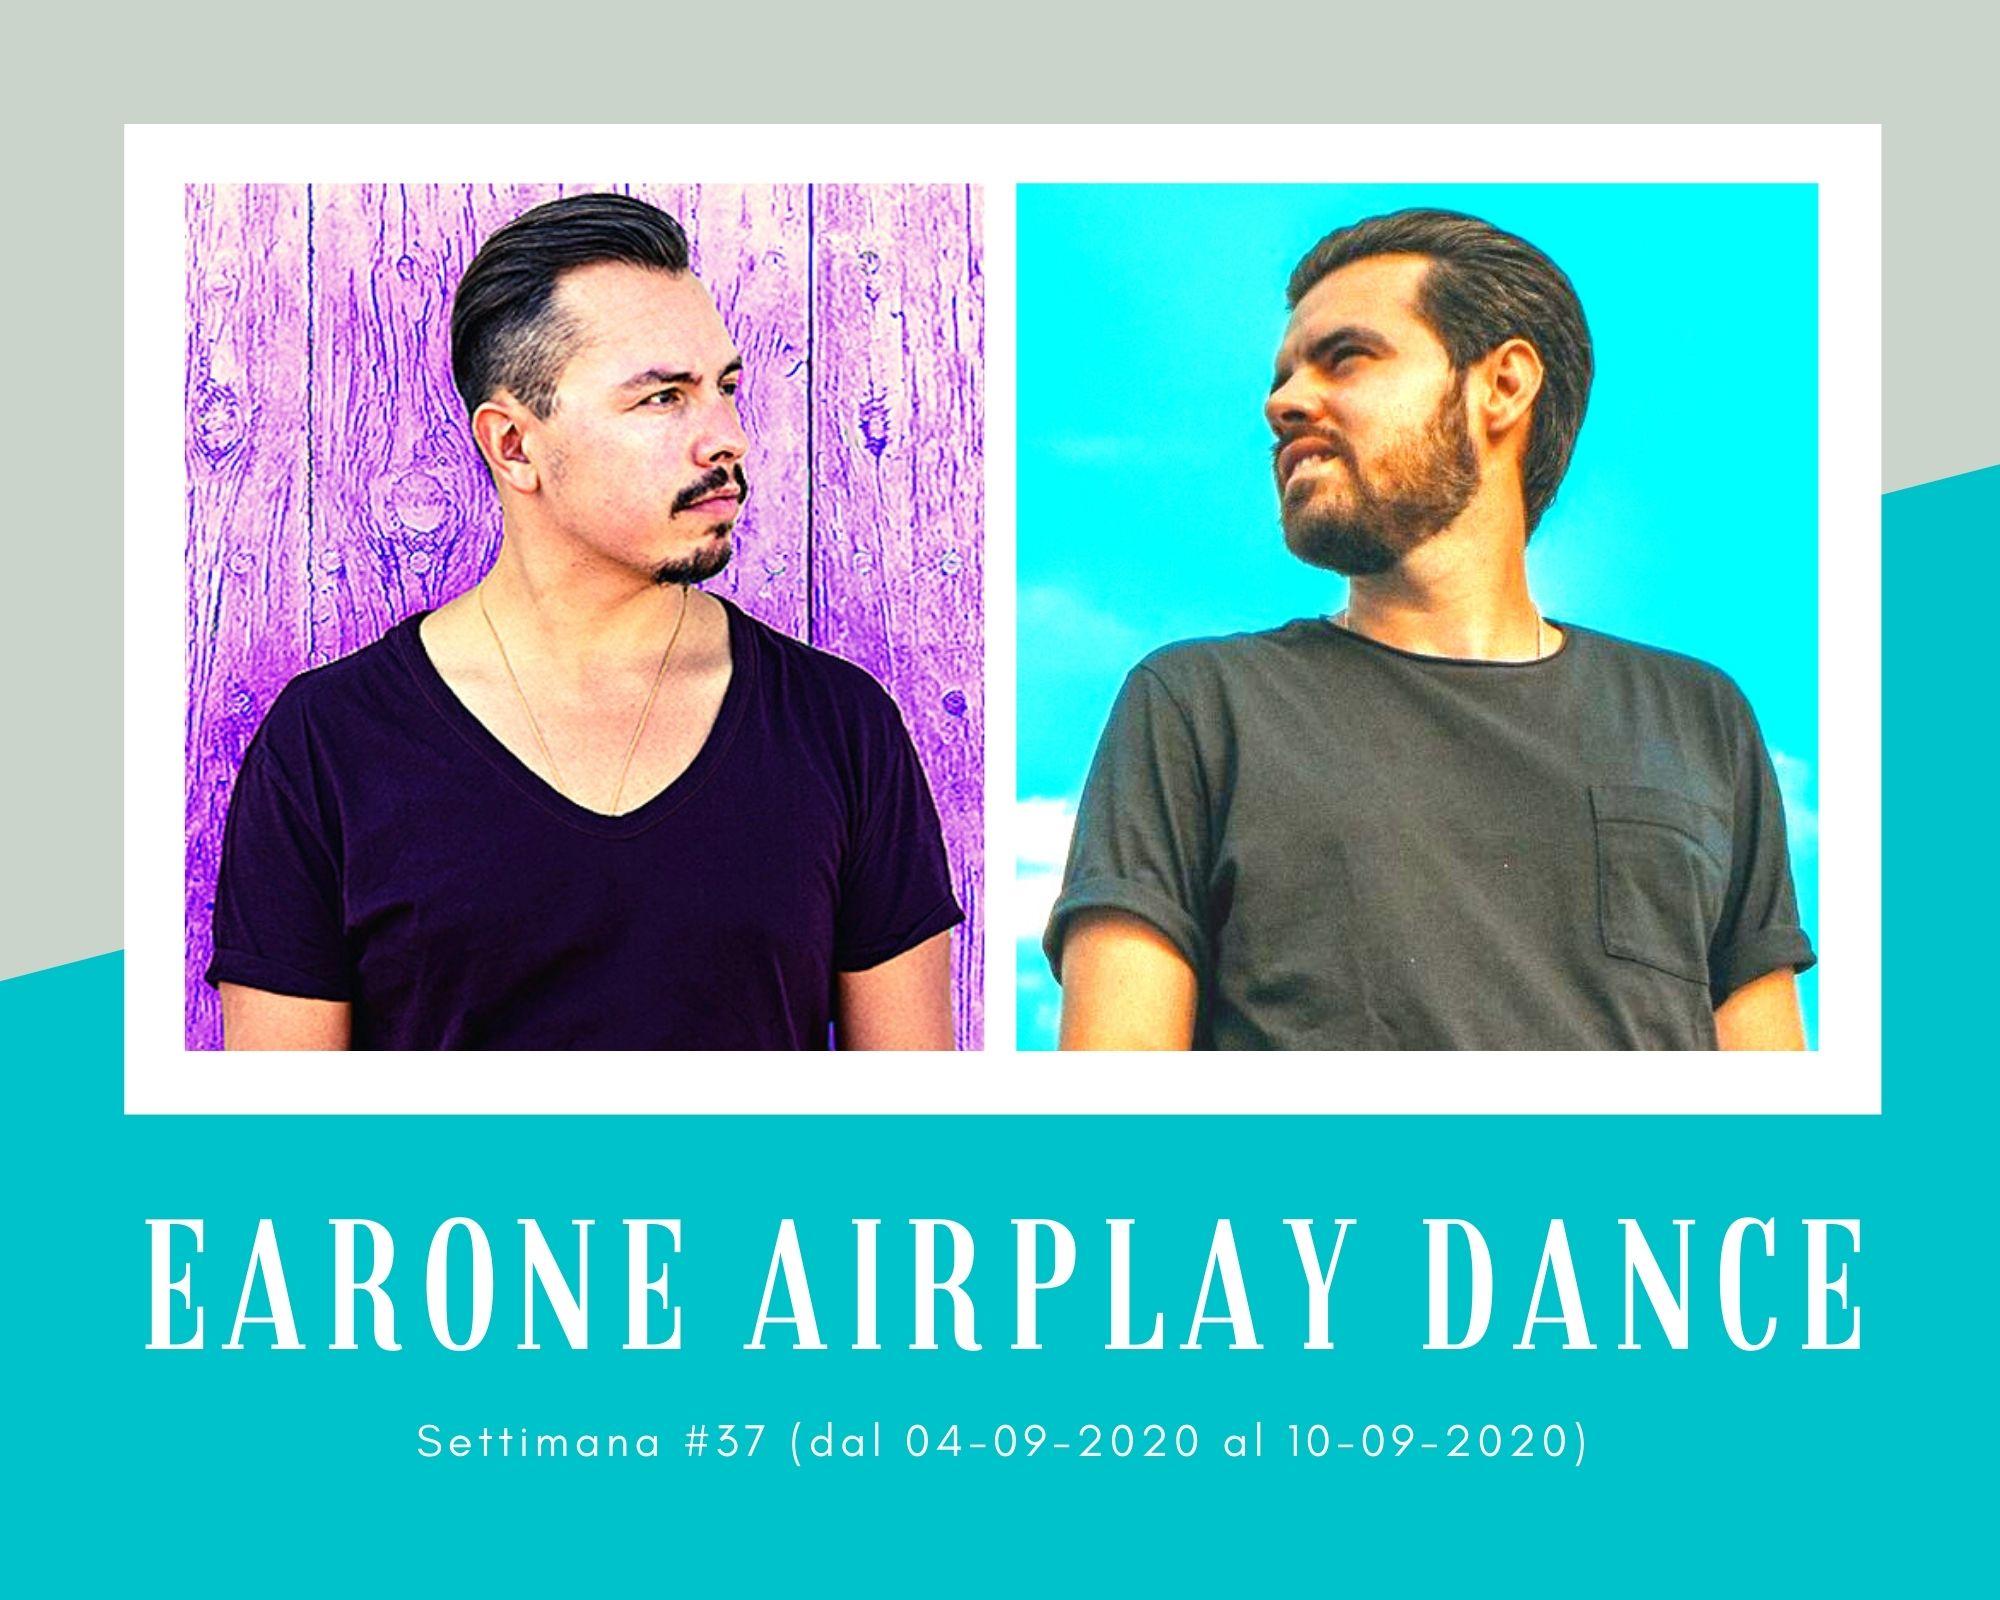 Classifica Radio EarOne Airplay Dance, week 37: Kareen Lomax e Mathieu Koss avanzano, Purple Disco Machine & Sophie and the Giants ritornano in vetta